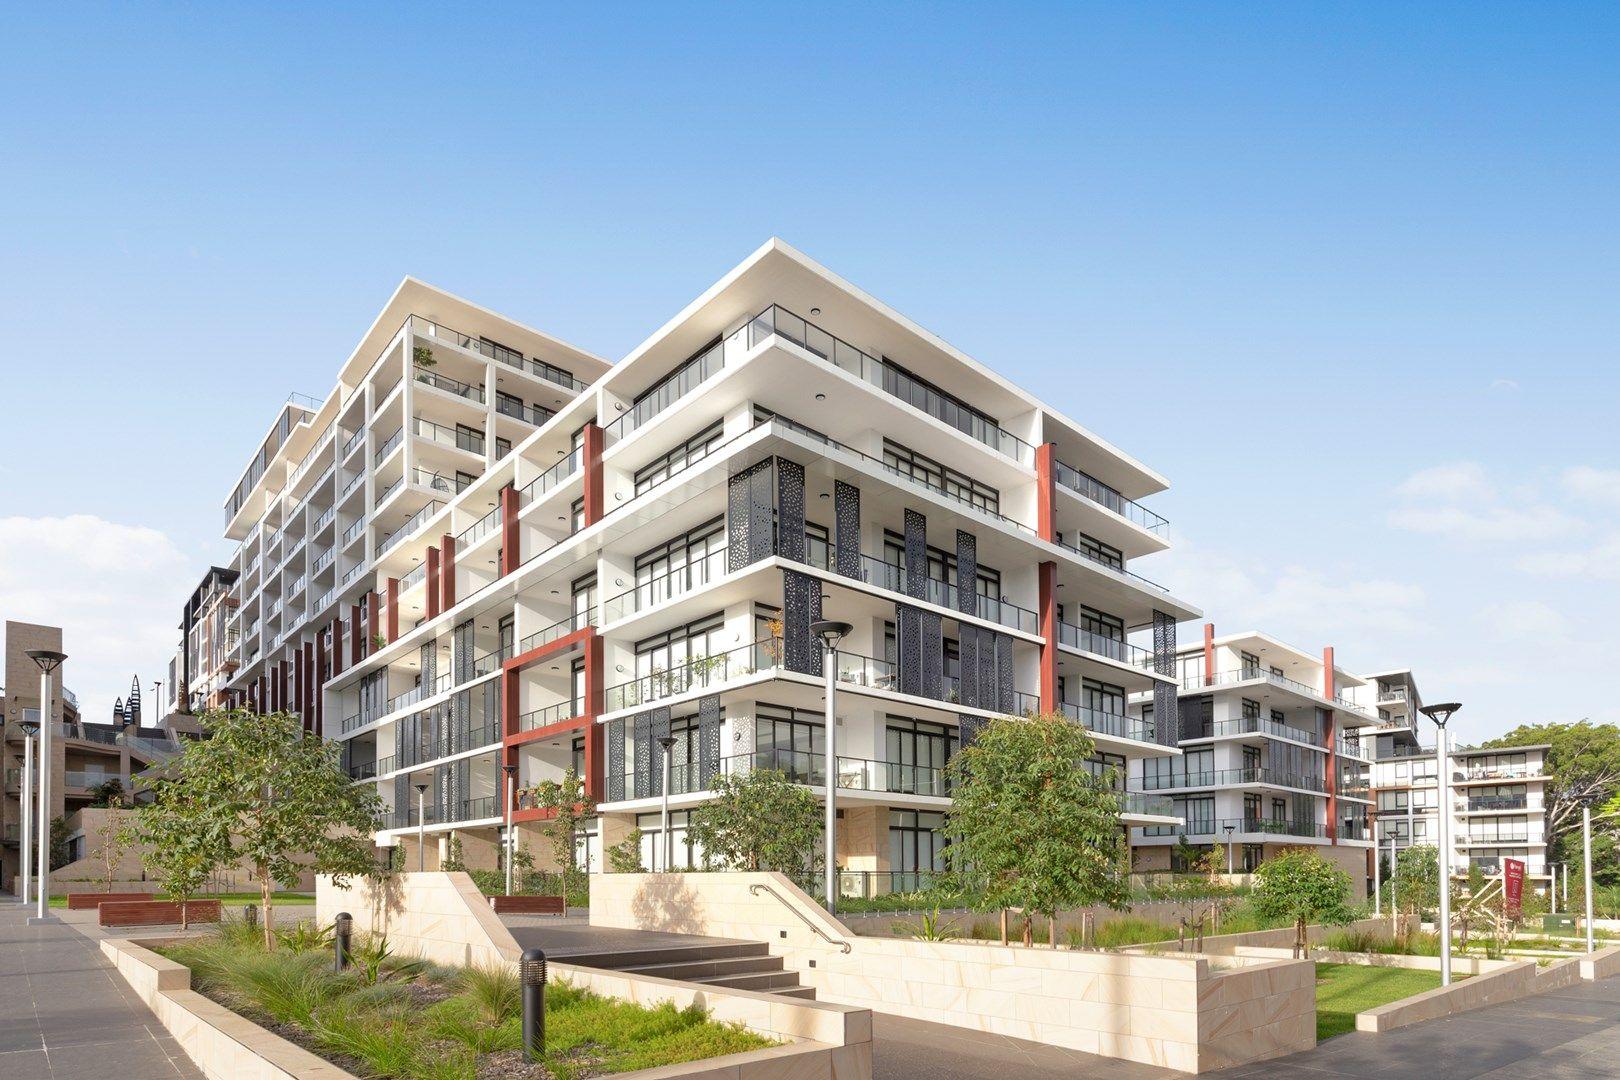 60 Nancarrow Avenue, Meadowbank, NSW 2114, Image 0